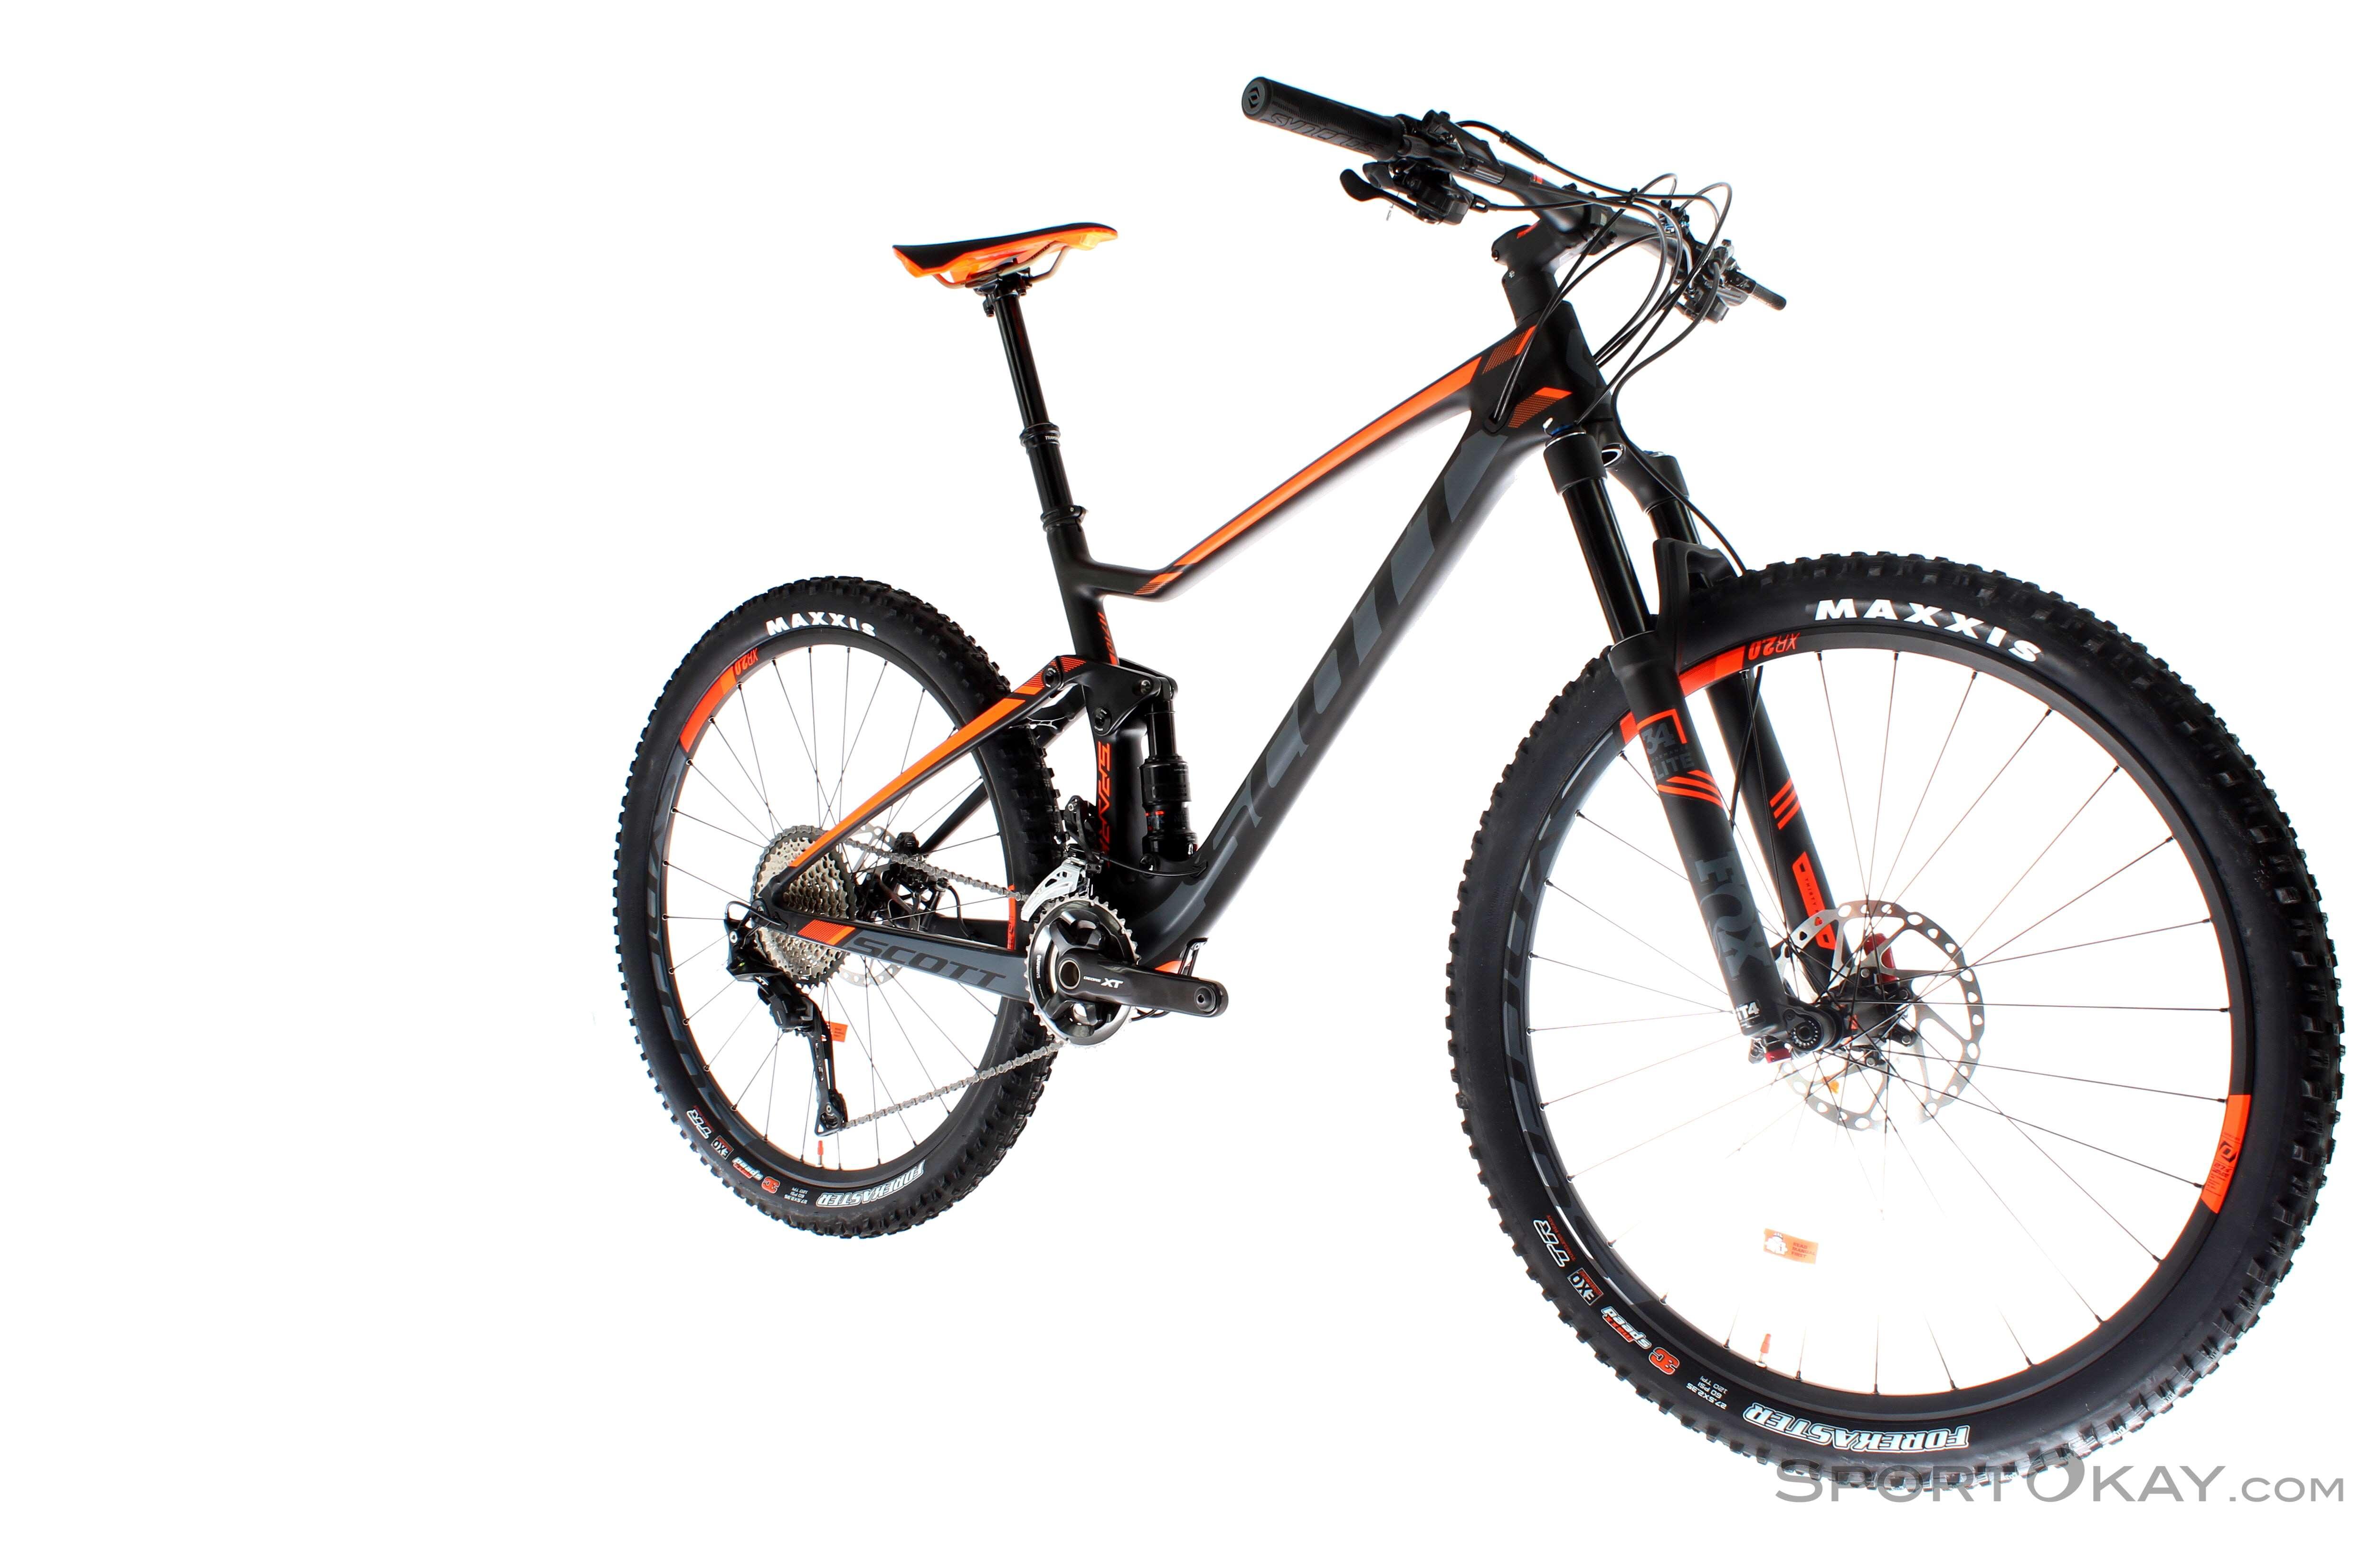 Scott Spark 710 2017 Trailbike, Scott, Schwarz, , Unisex, 0023-10451, 5637516765, 7613317641359, N1-01.jpg